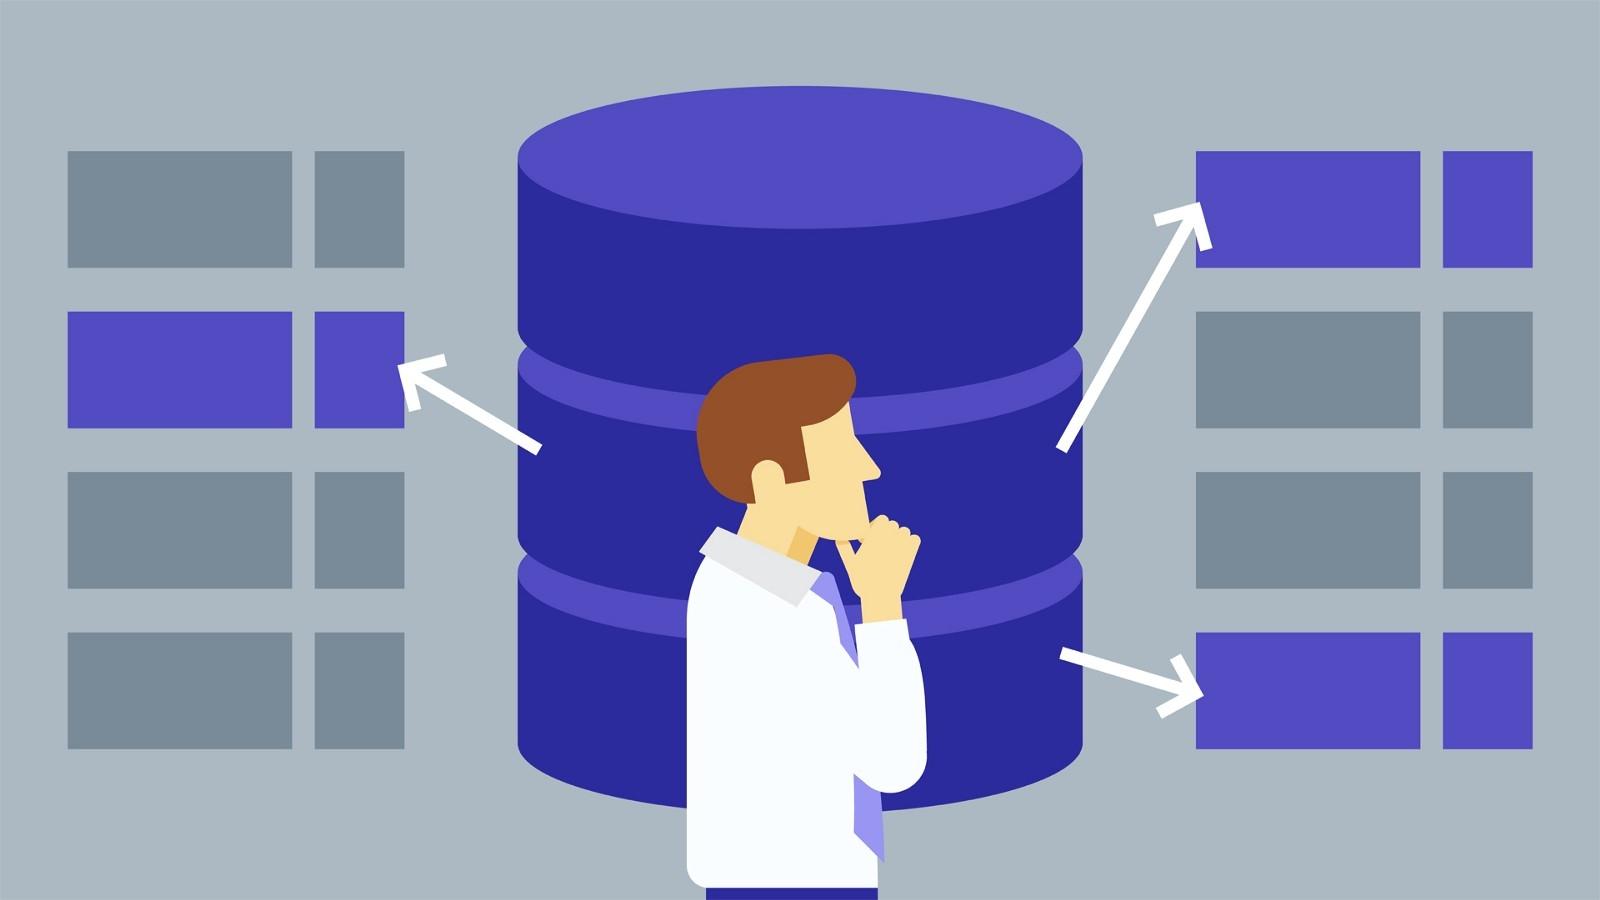 SmartBrains-MS-SQL-Server-DBA-Training-Database-Website-Development-Summer-Winter-Internship-Program-Certification-Noida-Delhi-Mumbai-Chennai-Dehradun-Pune